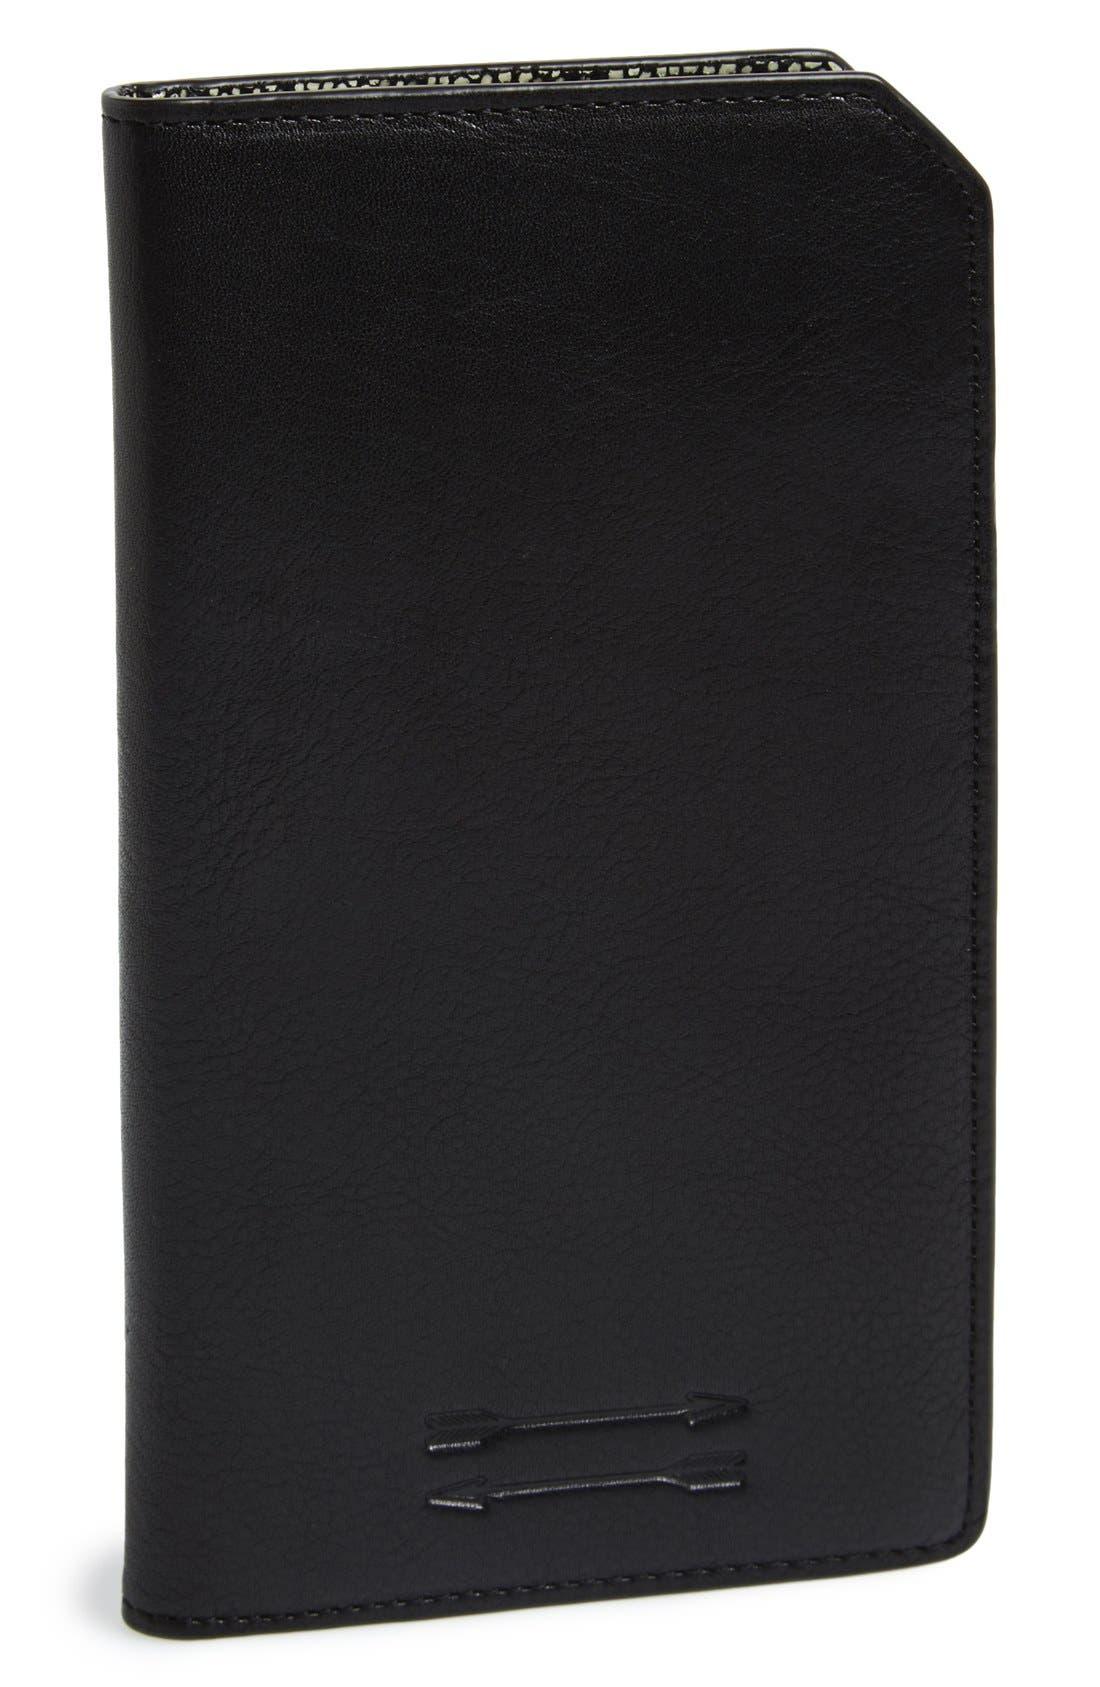 Ben Minkoff 'Orsay' Leather Passport Case,                             Main thumbnail 1, color,                             003